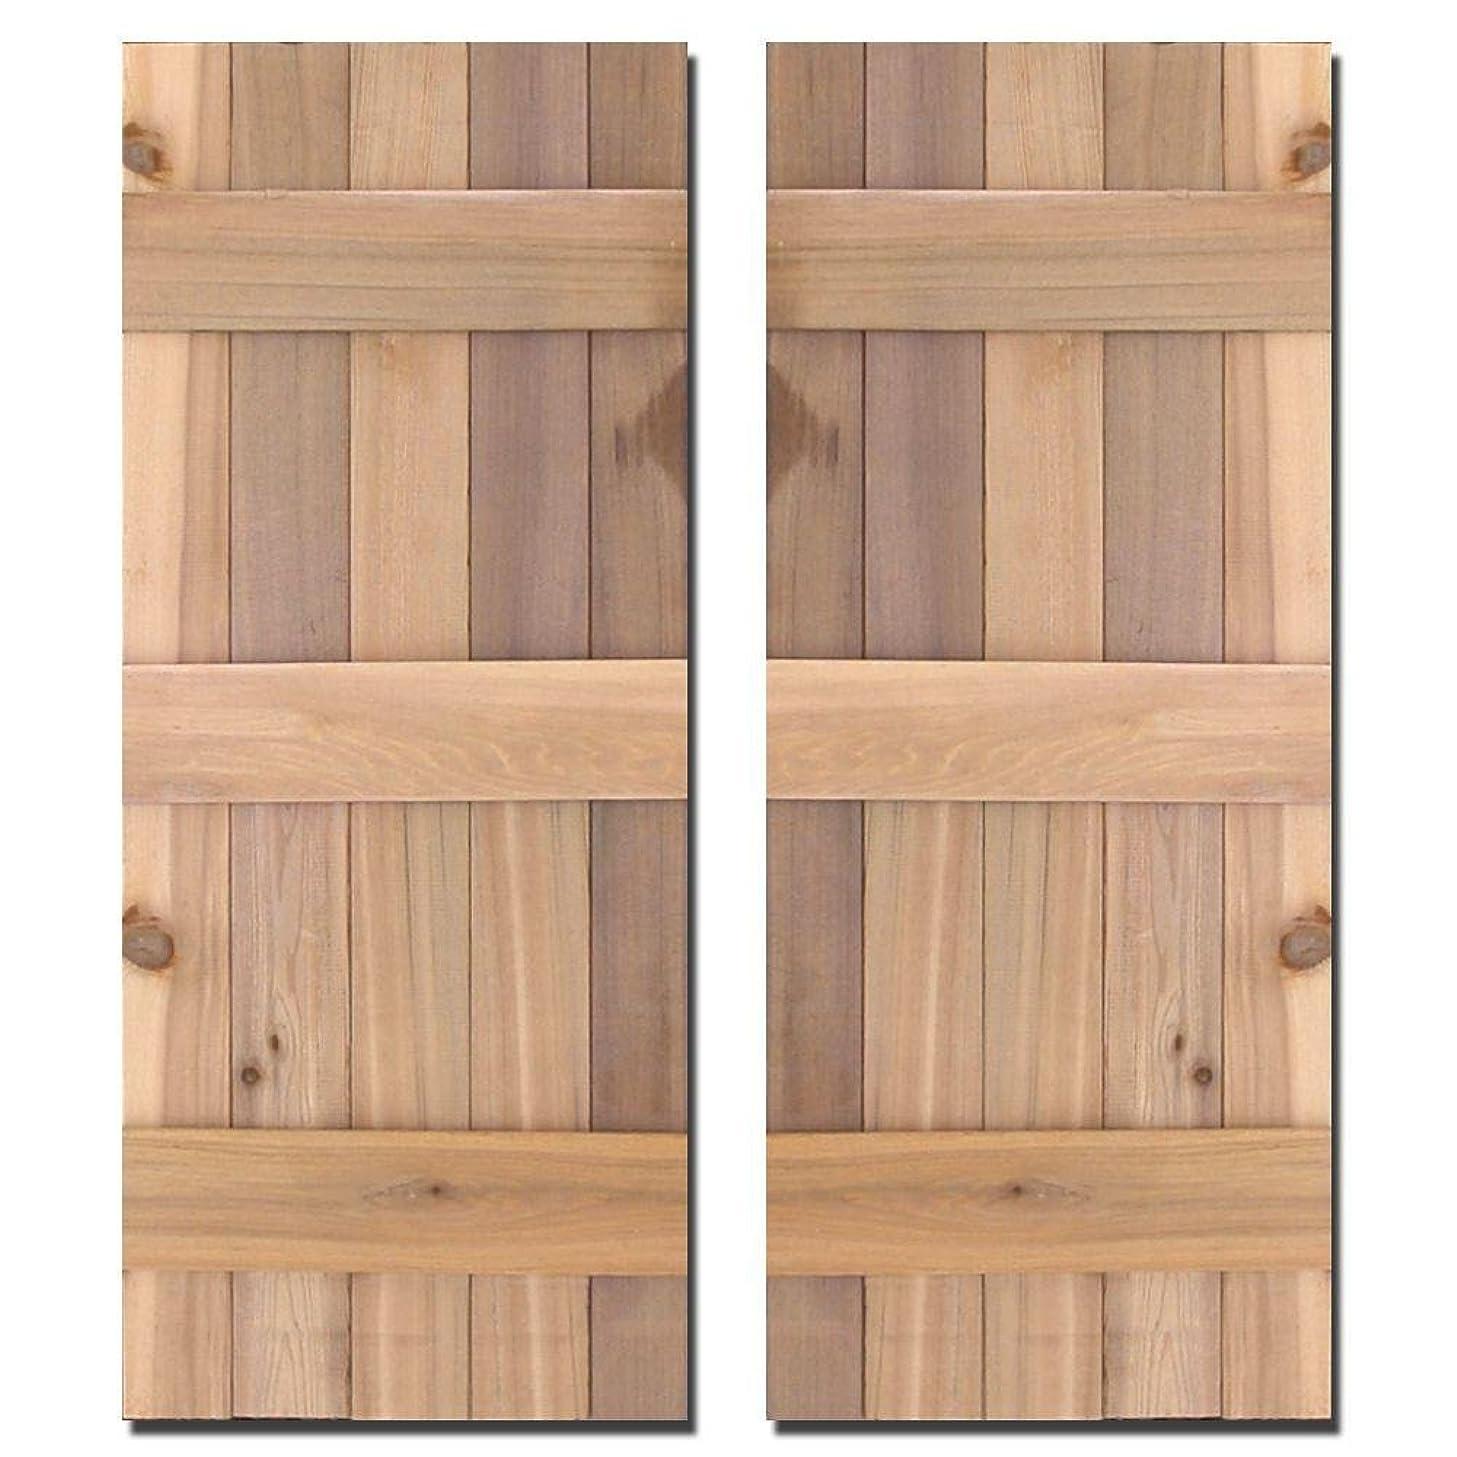 Design Craft MIllworks 15 in. x 52 in. Natural Cedar Board-N-Batten Baton Shutters Pair